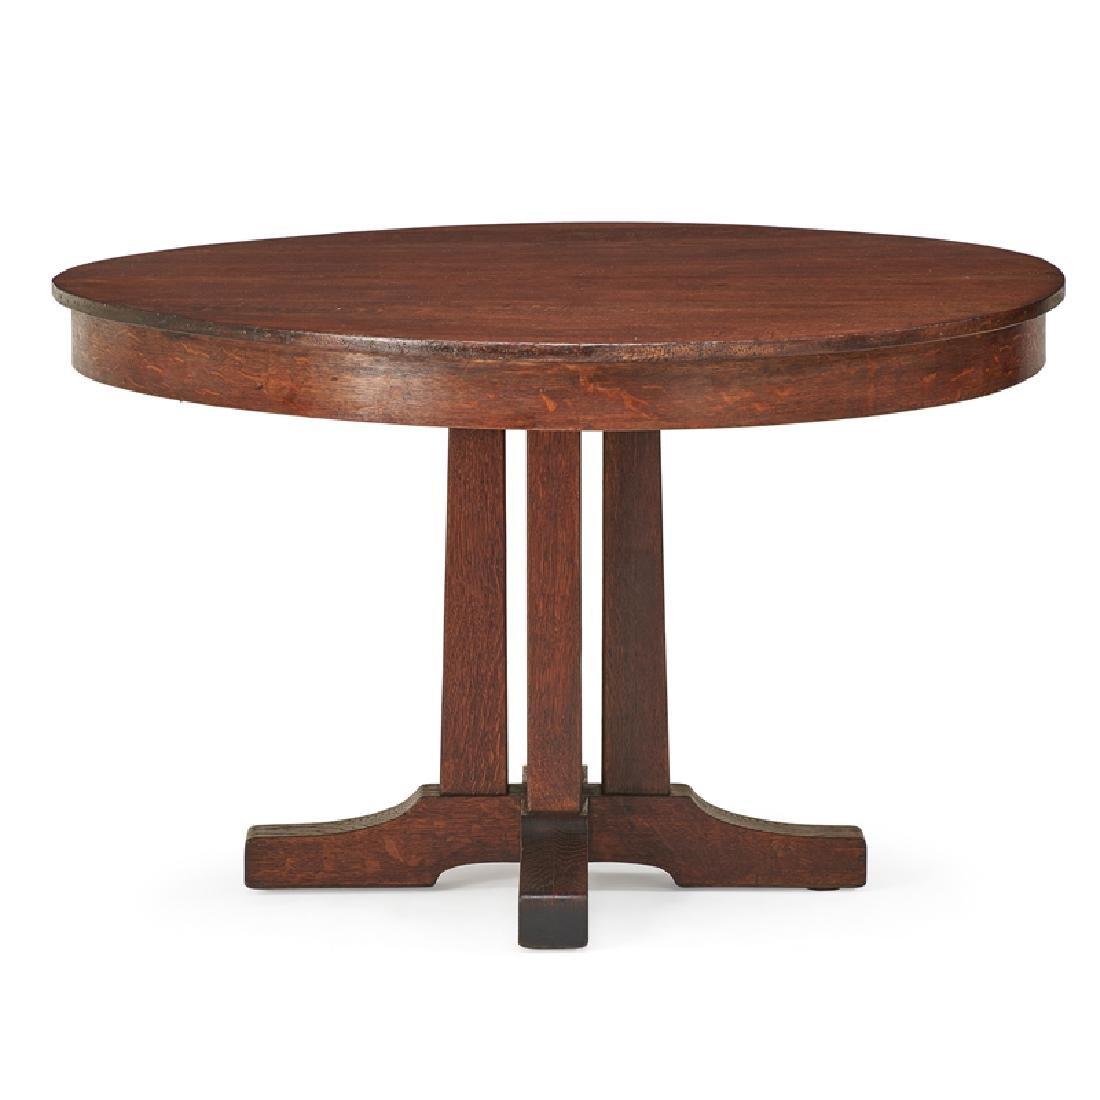 "L. & J.G. STICKLEY ""Prairie"" dining table"